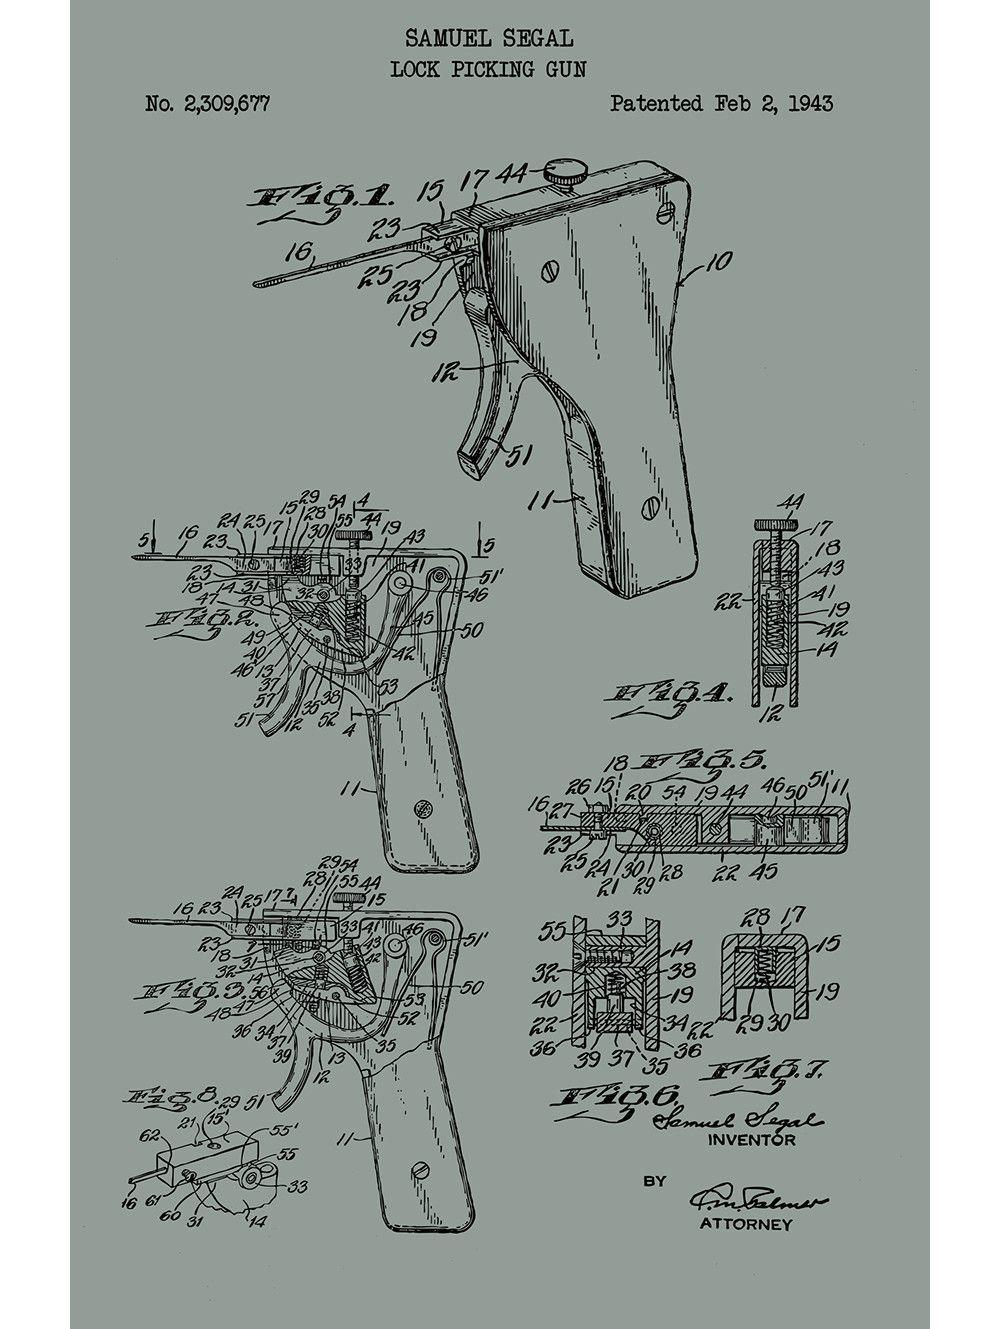 small resolution of lock picking apparatus samuel segal 1943